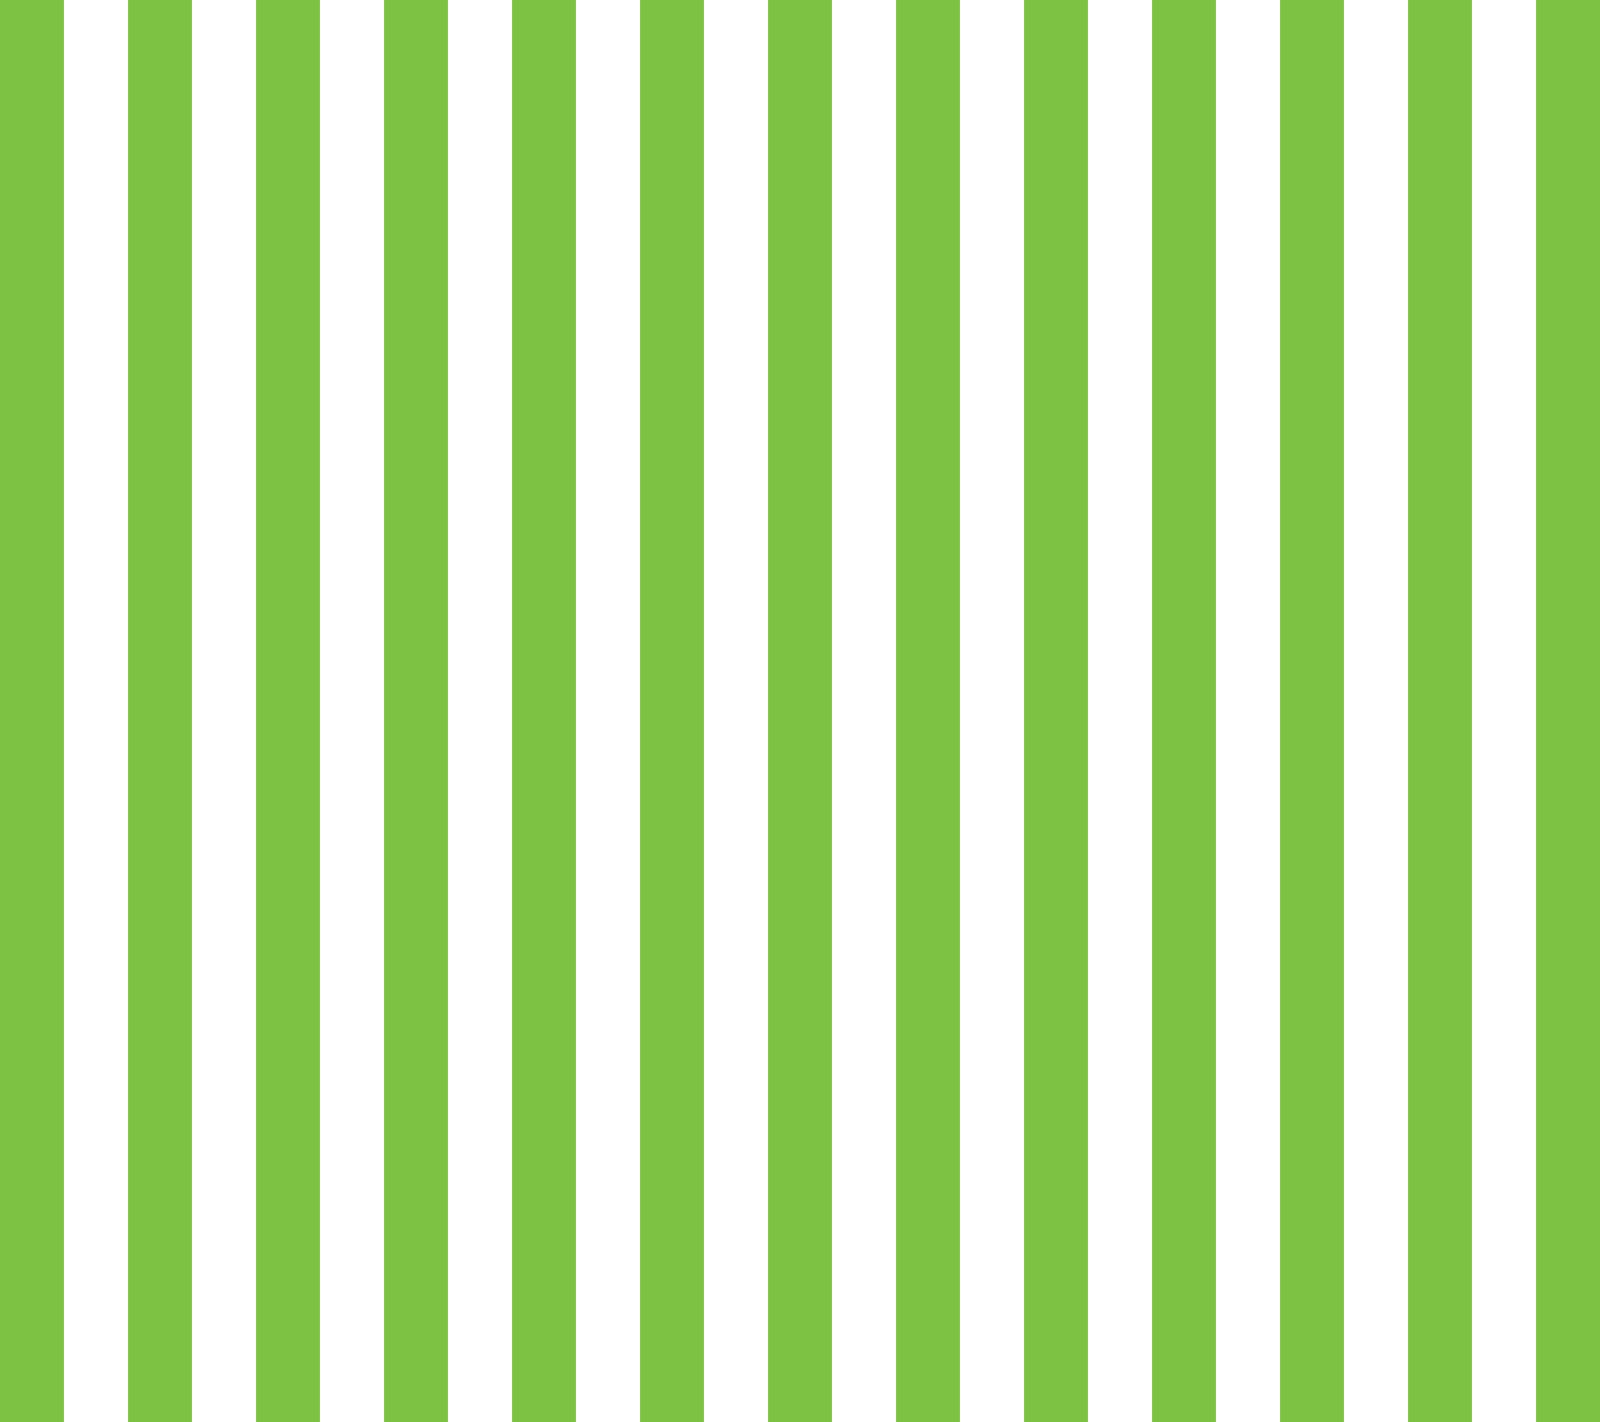 Green Stripes 1600x1422